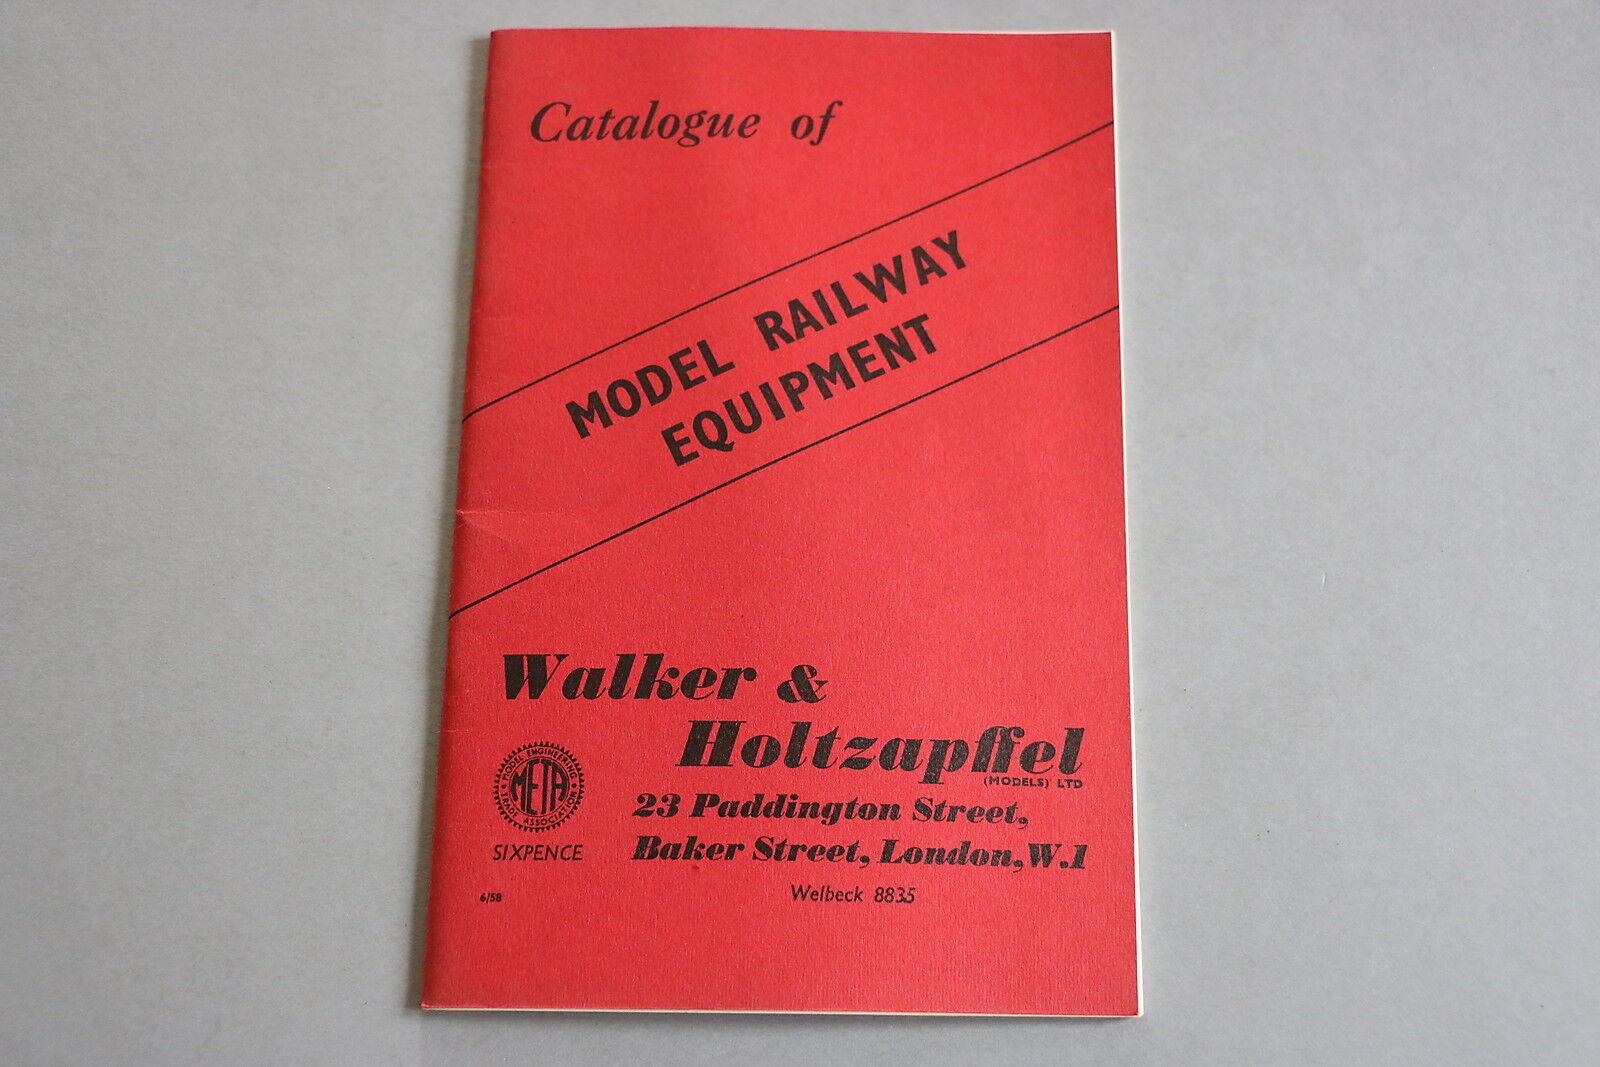 X475 WALKER HOLTZAPFELL Train catalogueTT O OO 1958 Model railway equipment